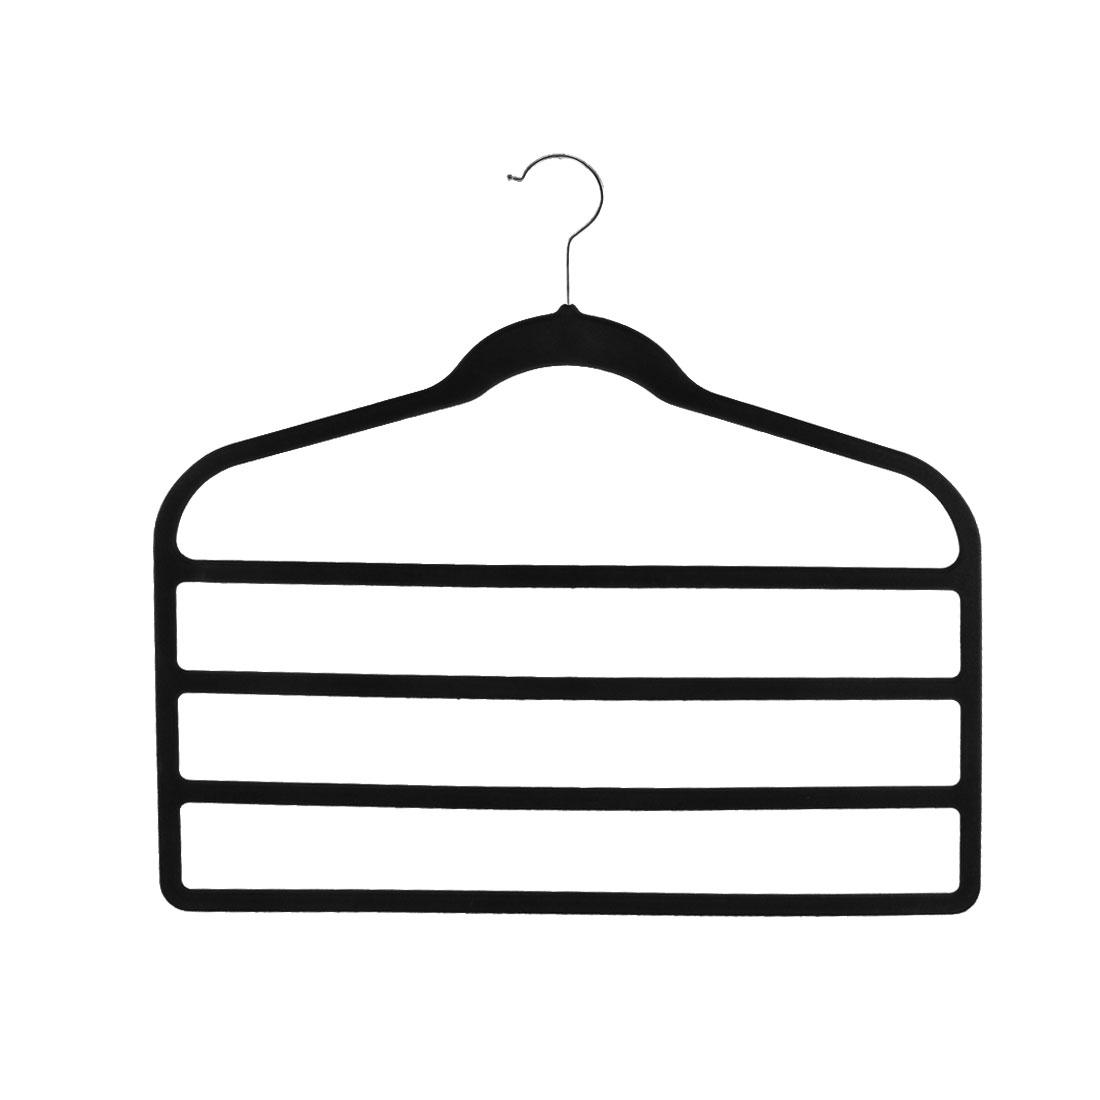 Home Velvet Anti-slip Shawl Coat Towel Clothes Trousers Holder Rack Organizer Black